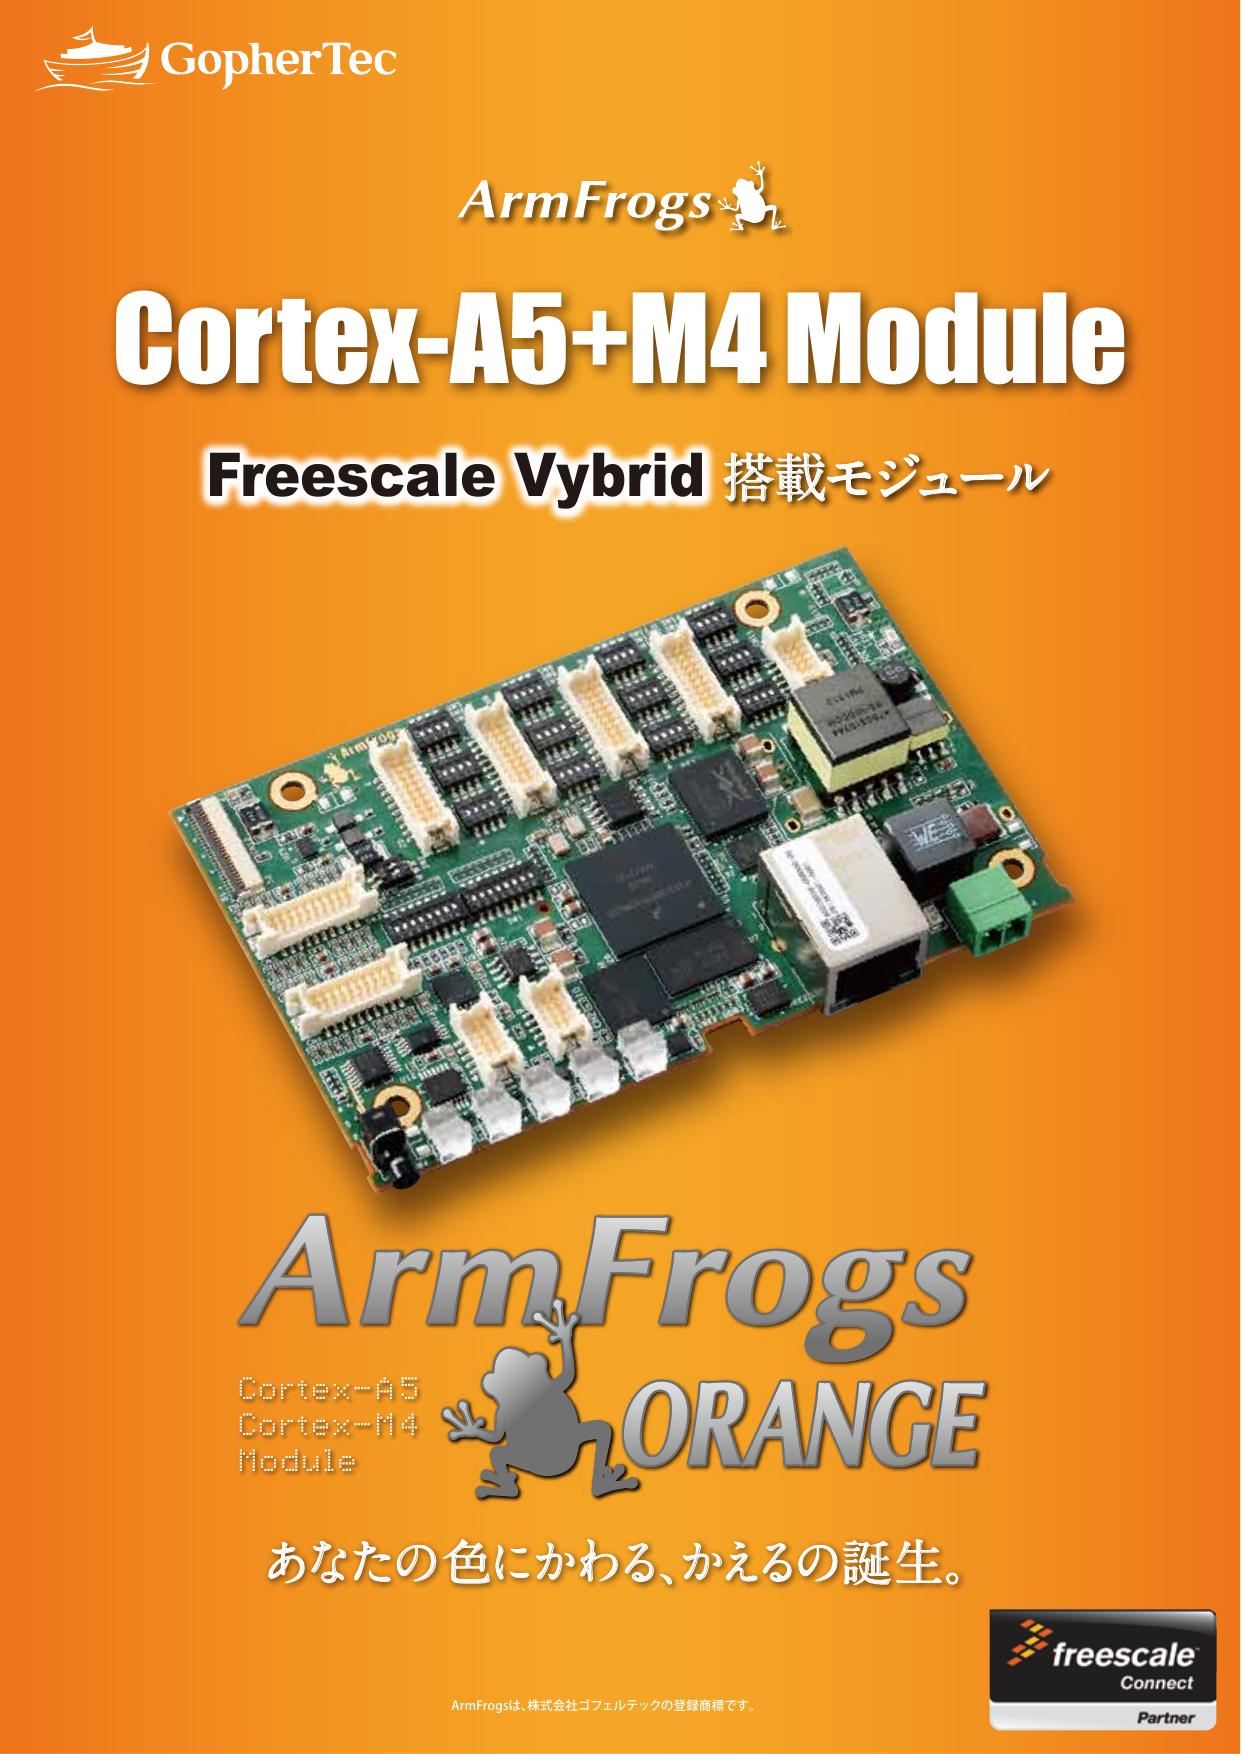 Cortex-A5+M4 Module Arm Frogs-ORANGE